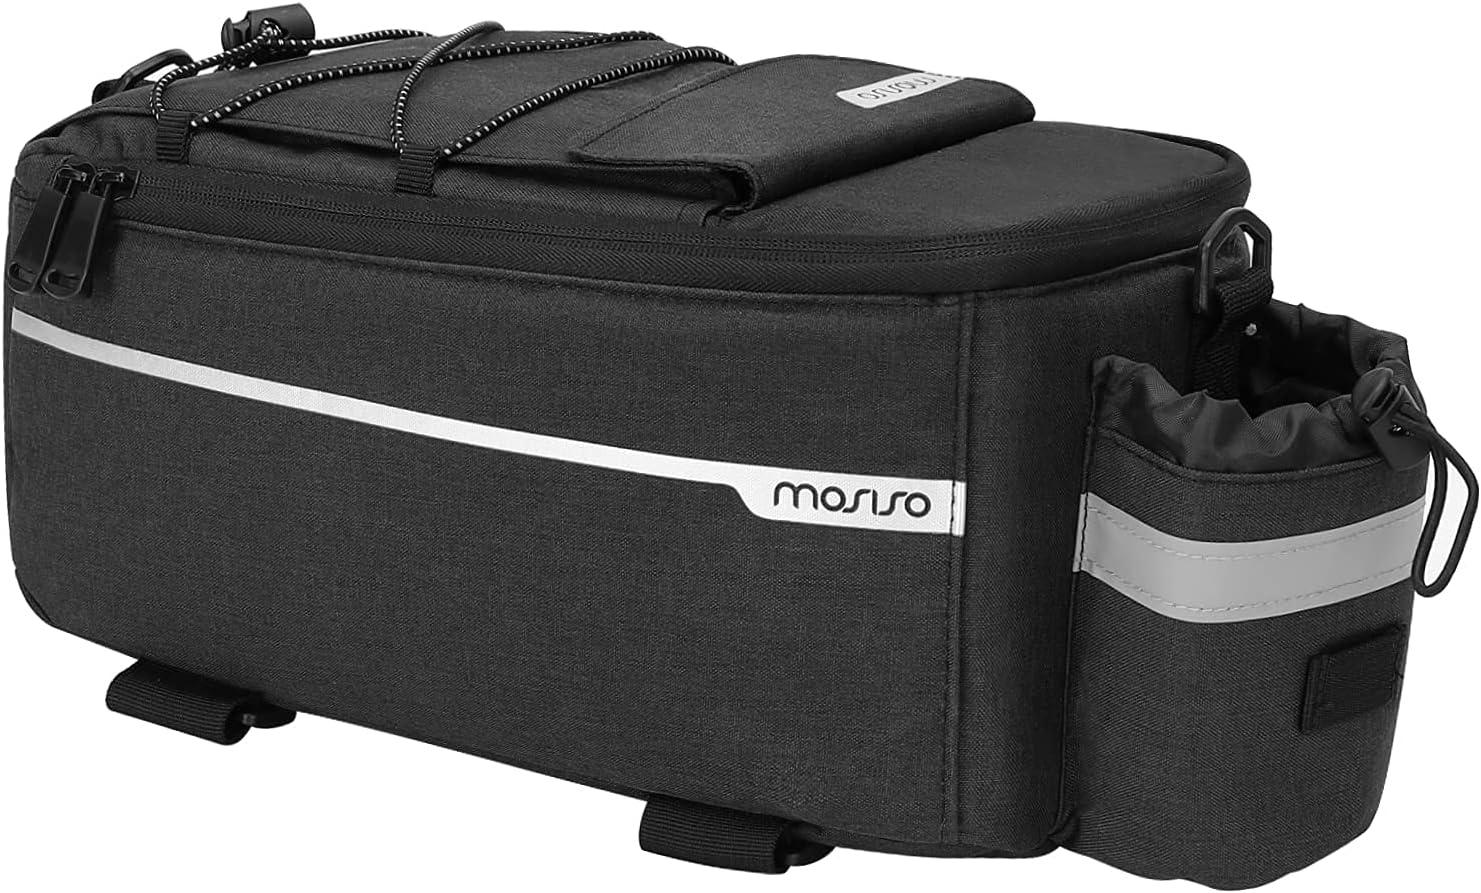 MOSISO cheap Bike Rack Bag Insulated Popular brand Waterproof Trunk Cooler